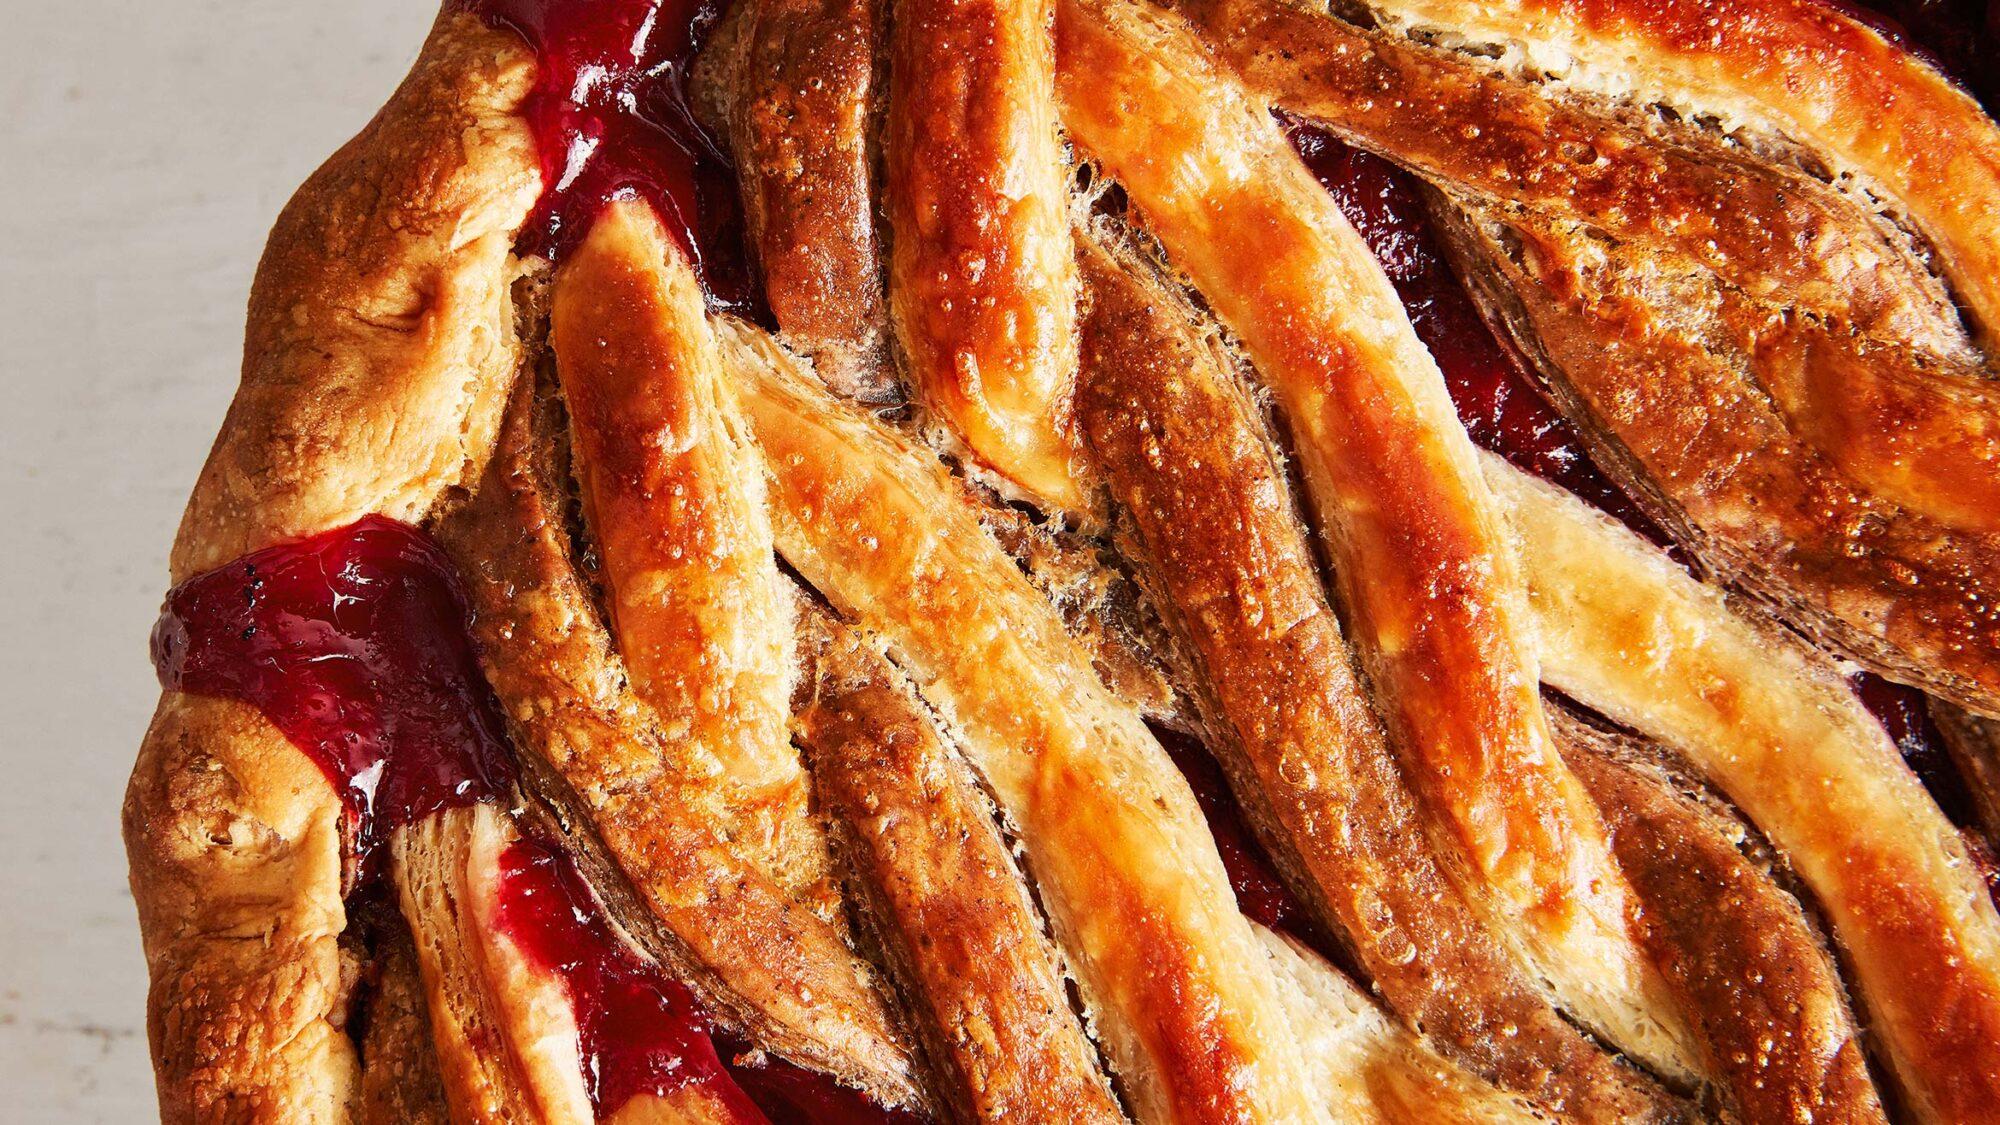 Article-Pie-Crust-Recipe-Book-on-Pie-Erin-Jeanne-McDowell